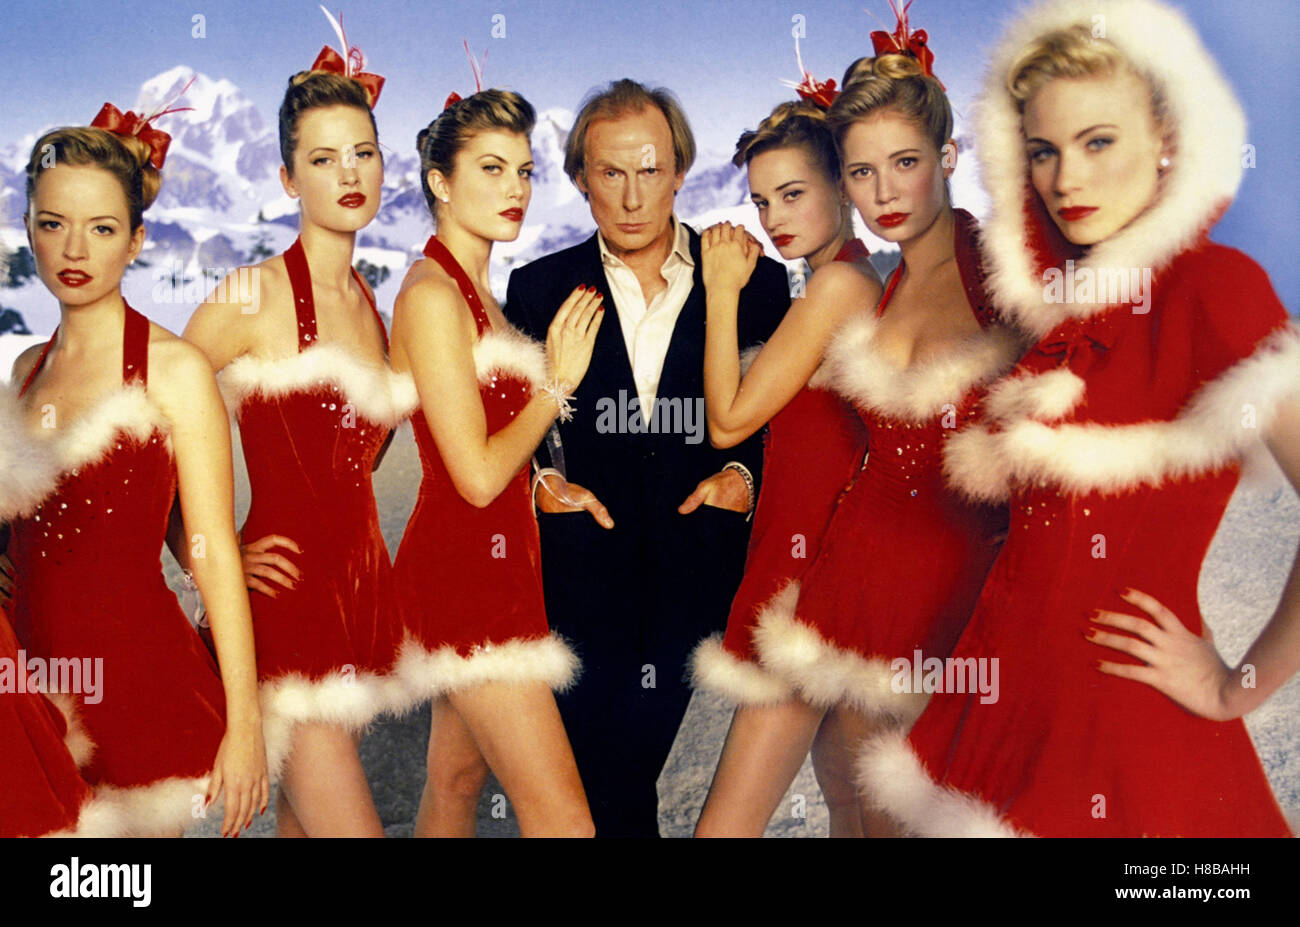 Tatsaechlich...Liebe, (LOVE ACTUALLY) GB 2003, Regie: Richard Curtis, BILL NIGHY, Key: Revue, Revue-Girls, - Stock Image